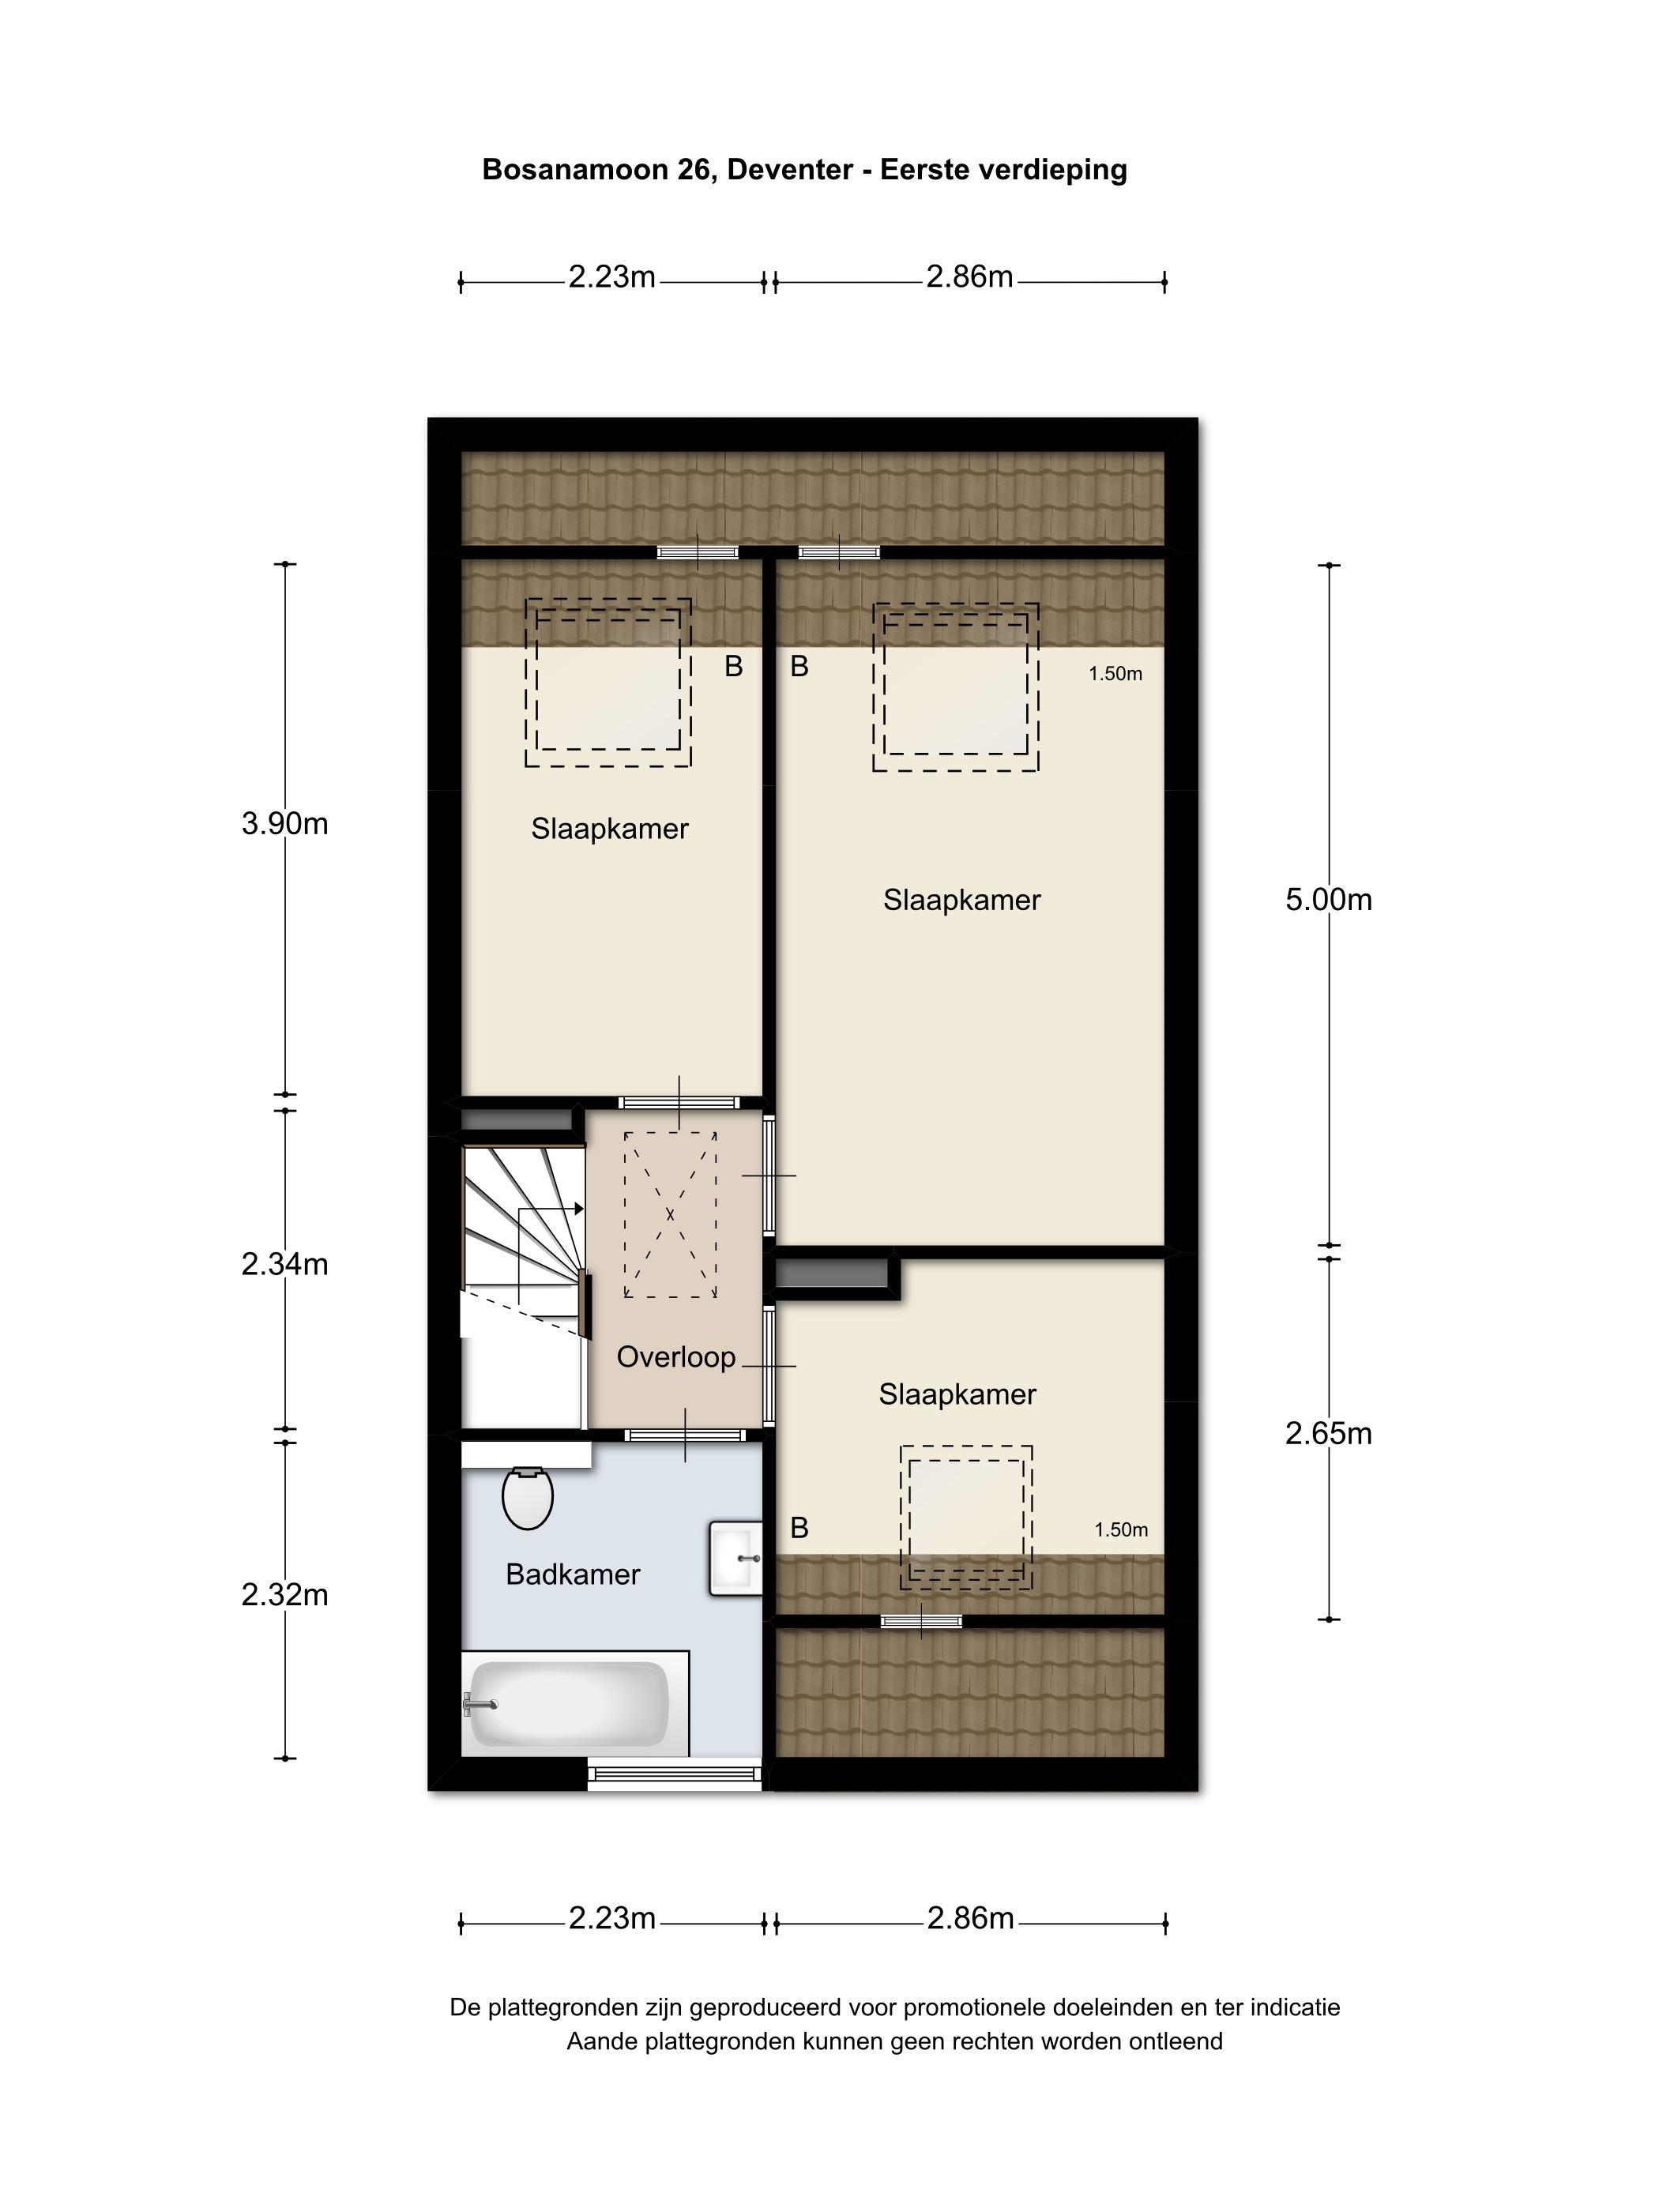 Groene Keuken Deventer : Huis te koop: Bosanemoon 26 7422 NW Deventer [funda]